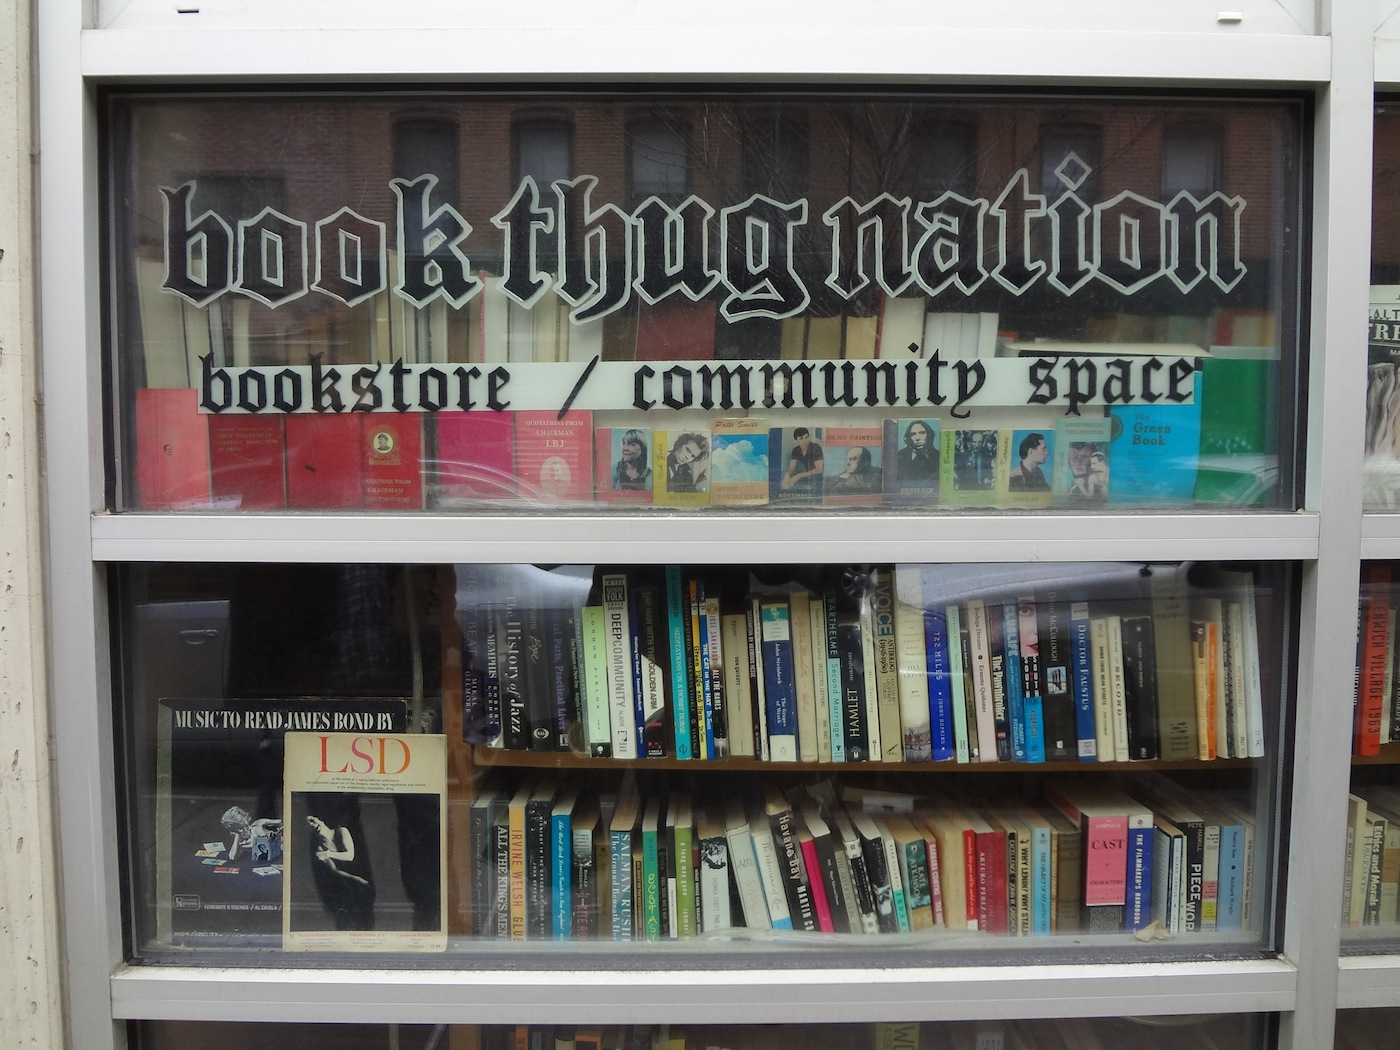 book-thug-nationhome.jpg